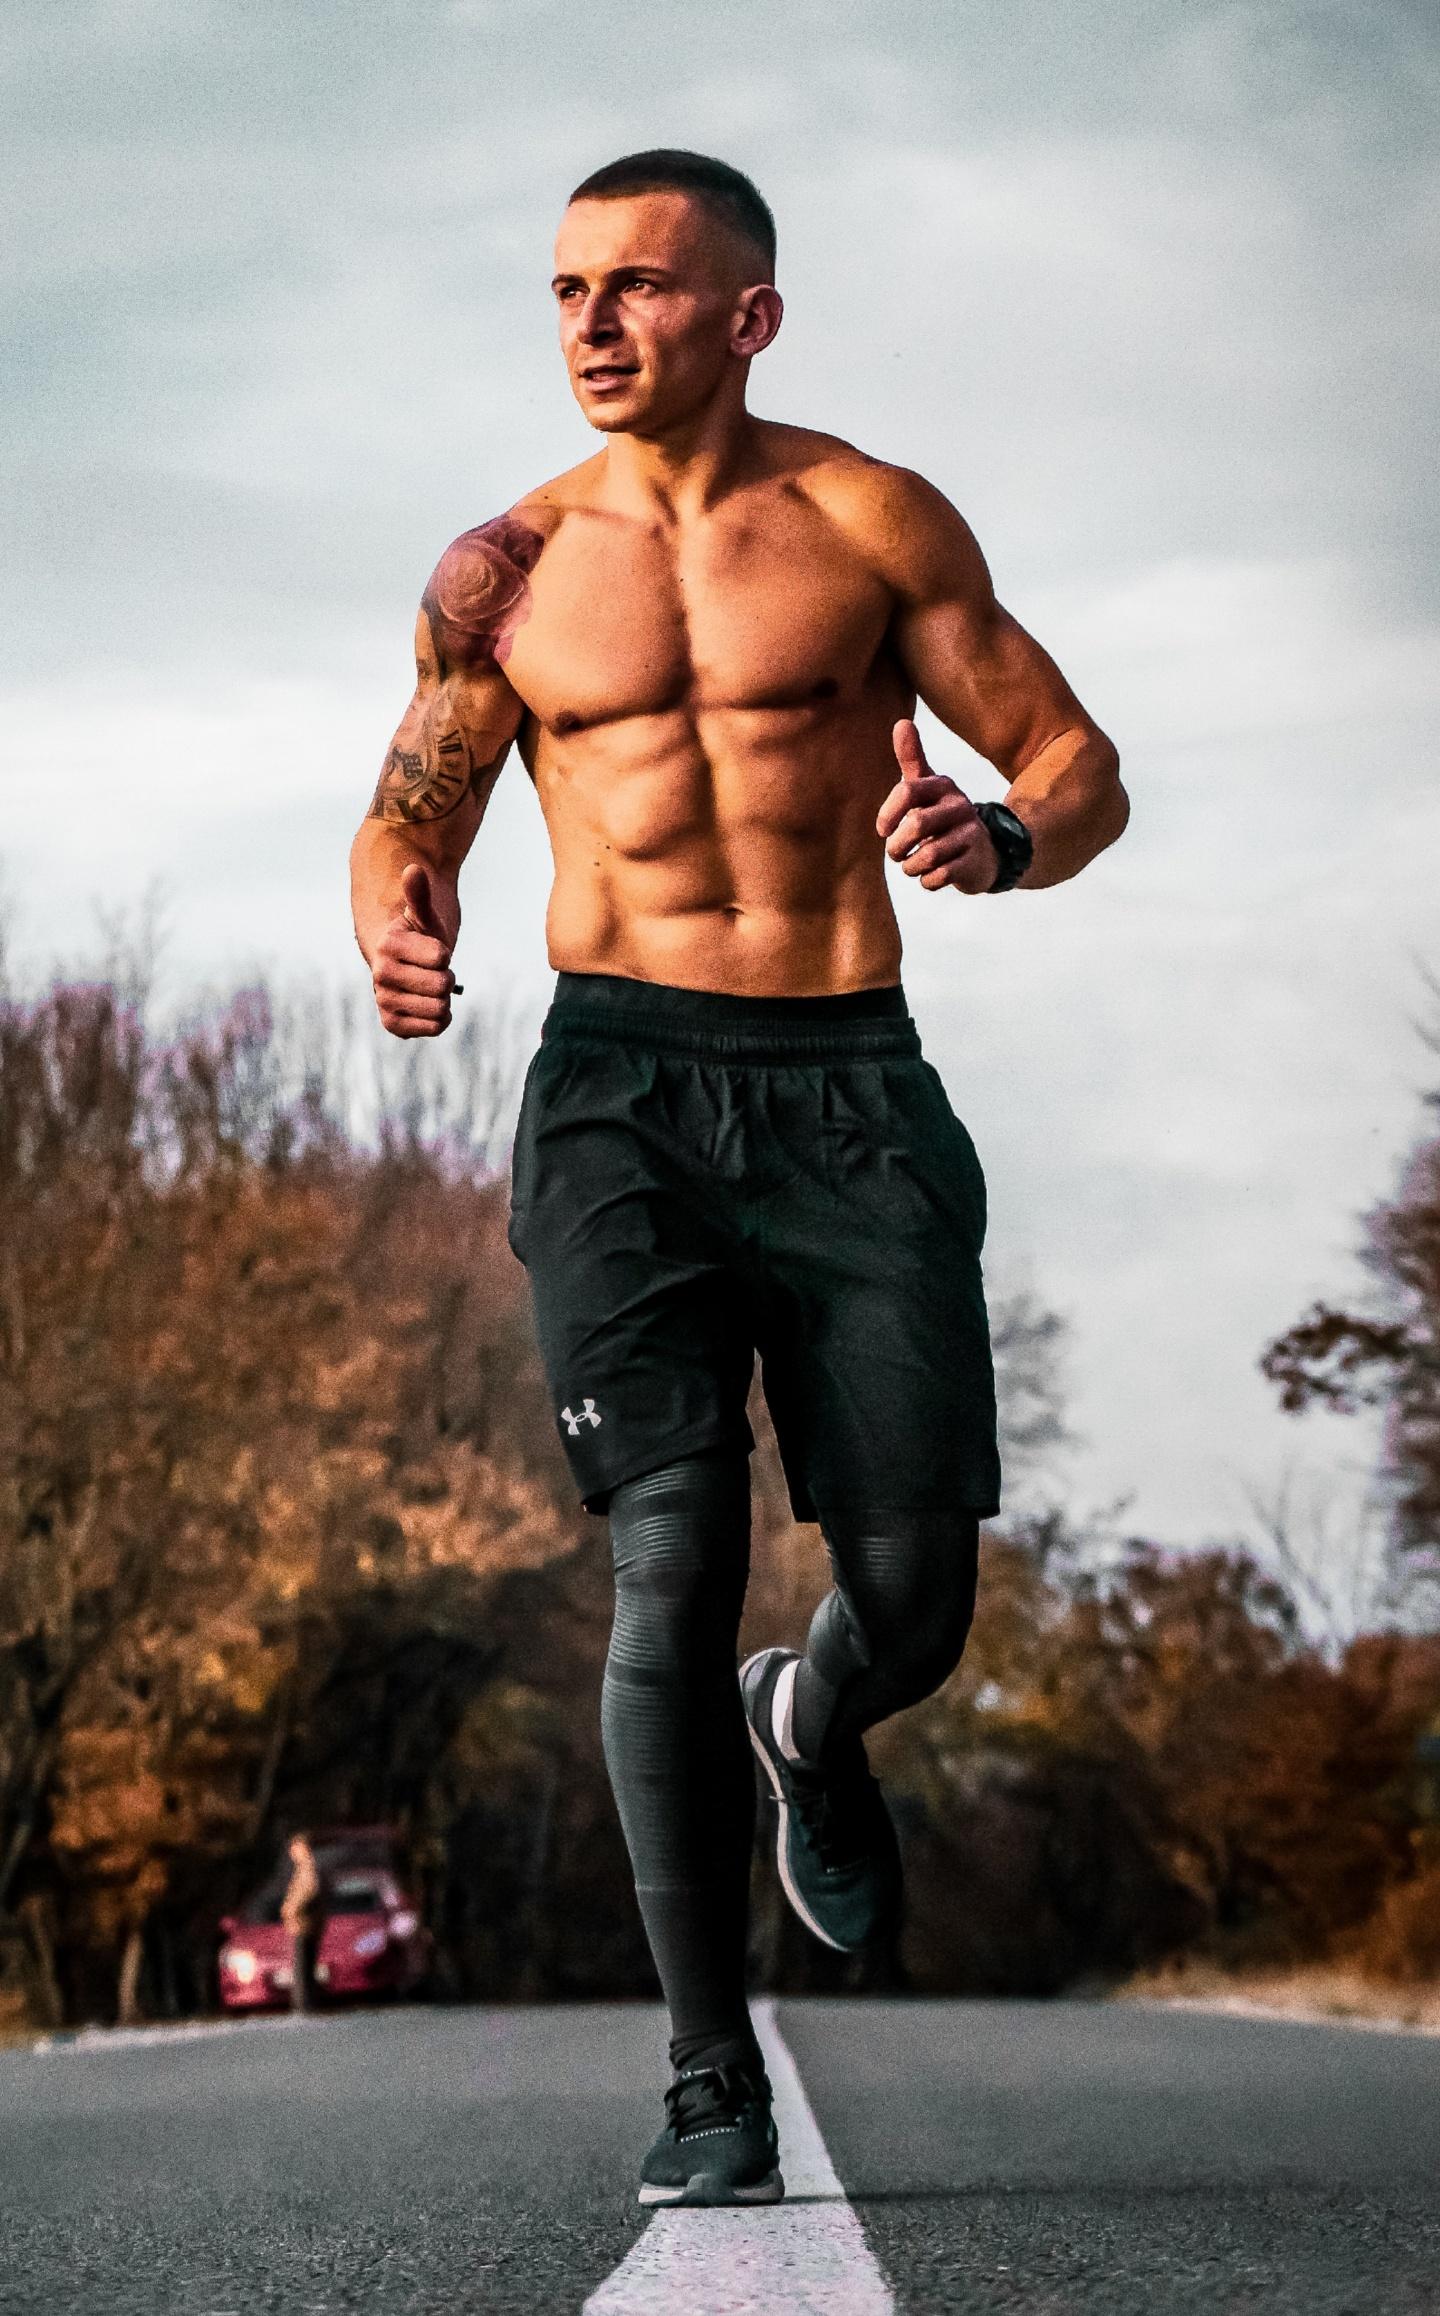 Mann, Joggen, Sixpack, Bauchmuskeln, Training